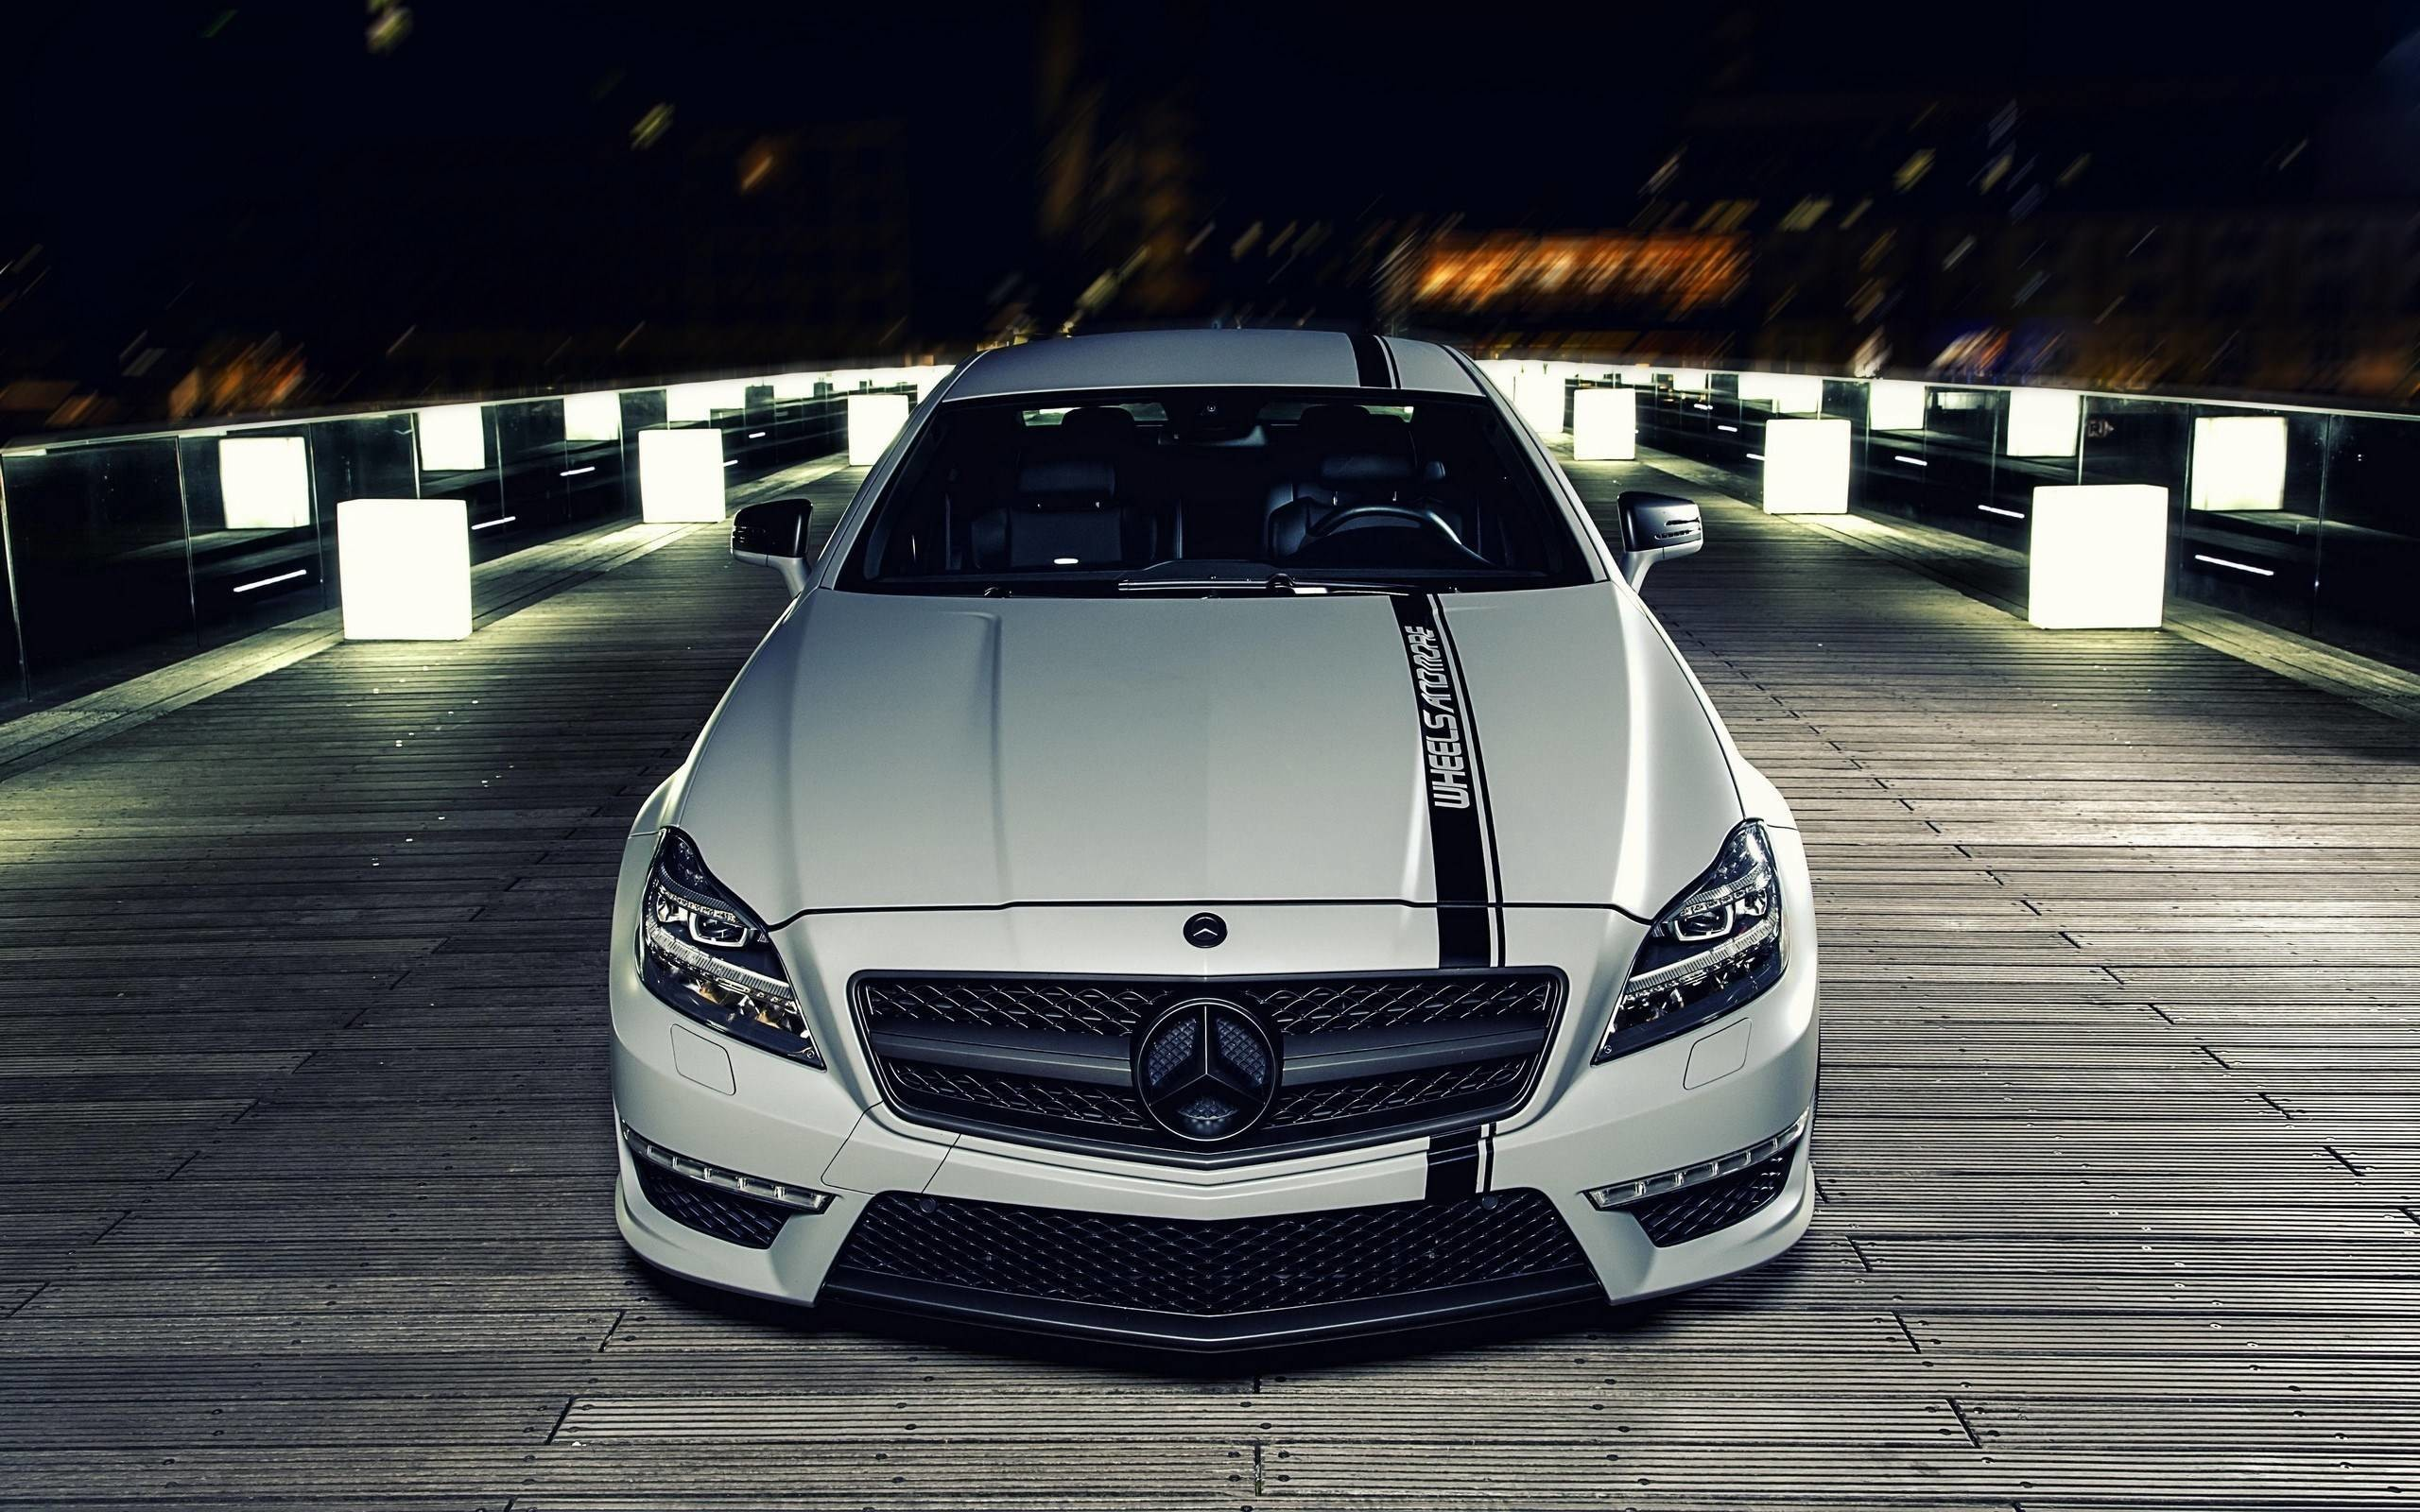 2560x1600 Mercedes Benz CLS63 AMG Photo HD Wallpaper   FreeHDWalls